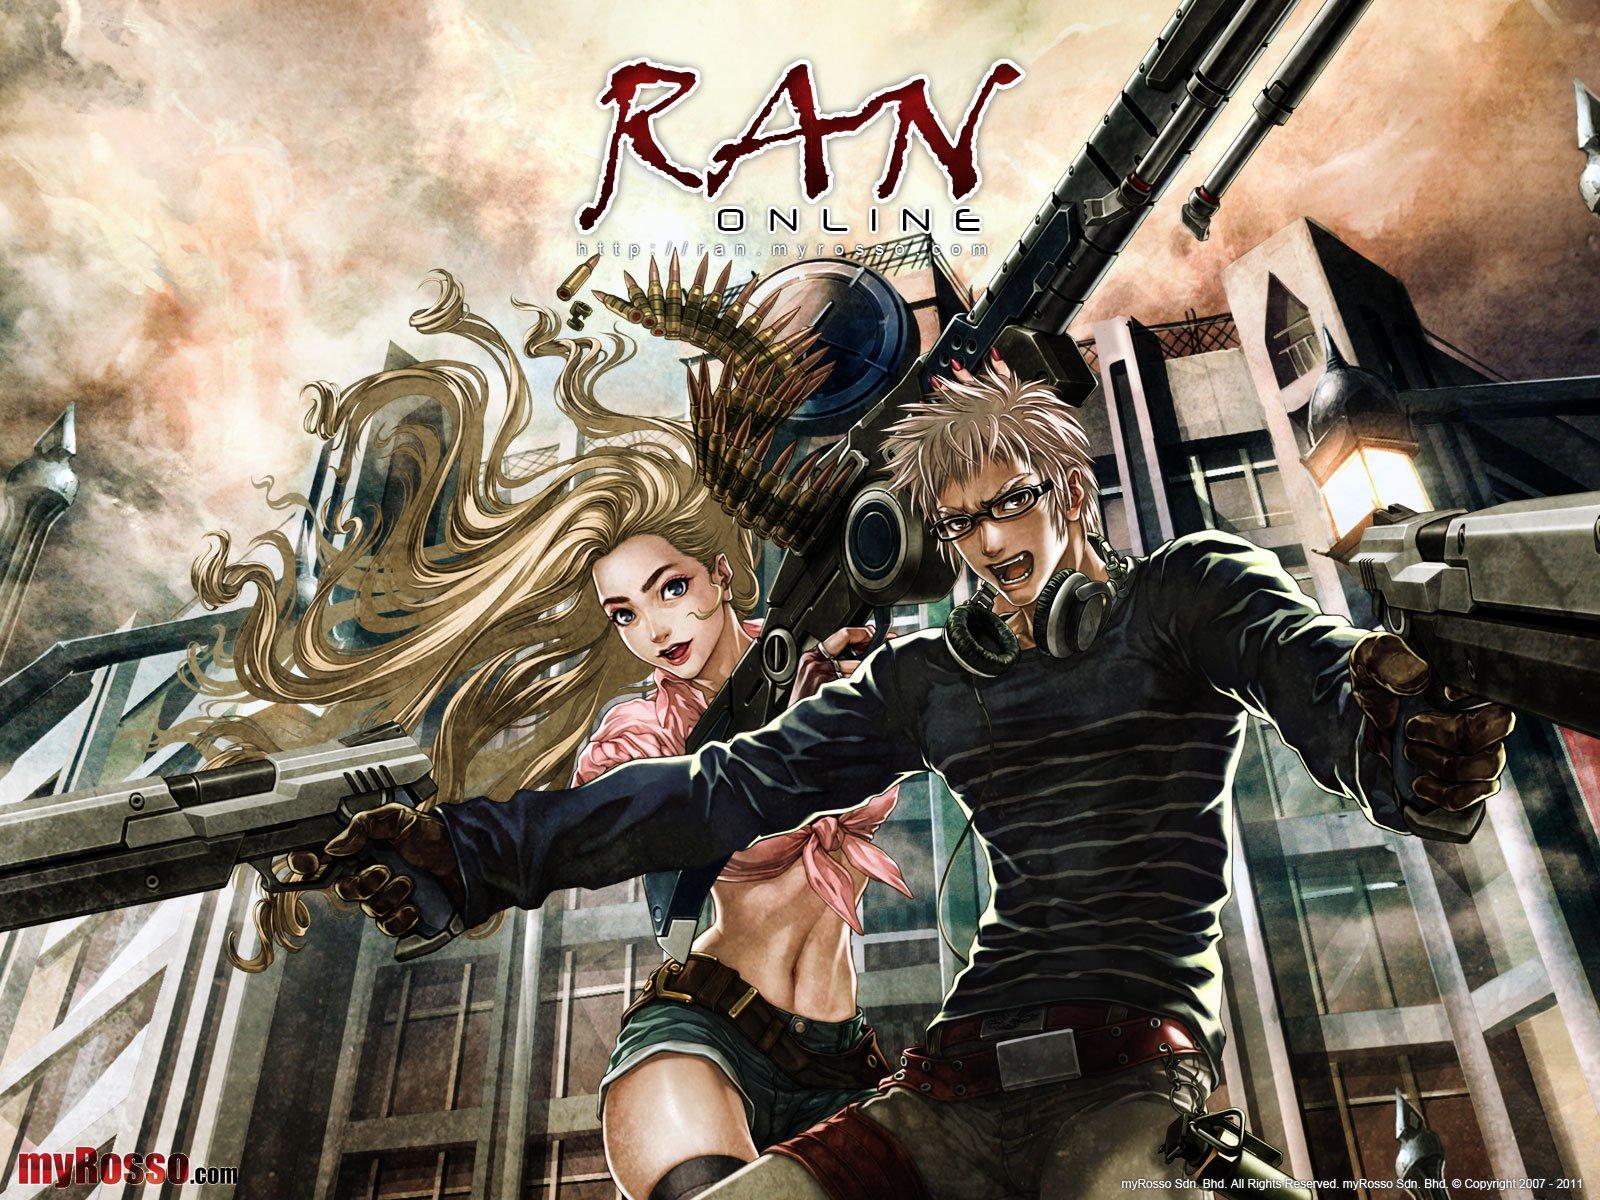 Wallpaper : 1600x1200 px, 1rano, action, adventure, anime